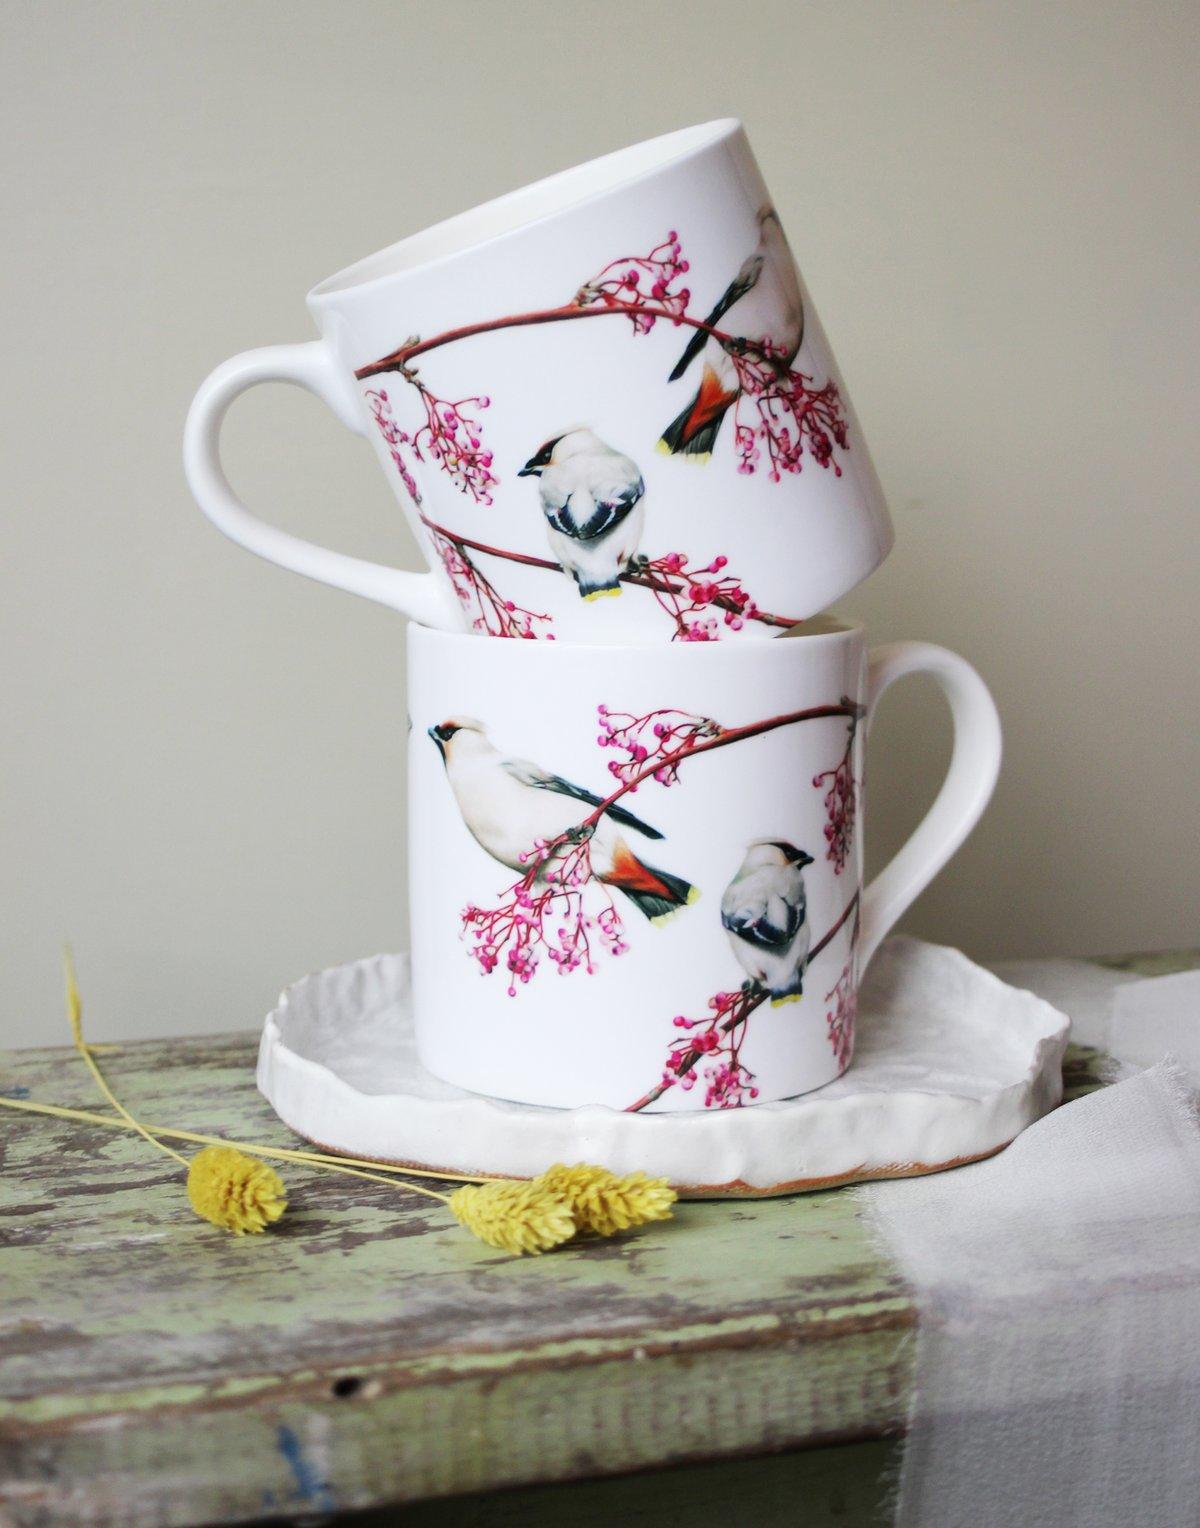 Image of 'Winters Delight' mug